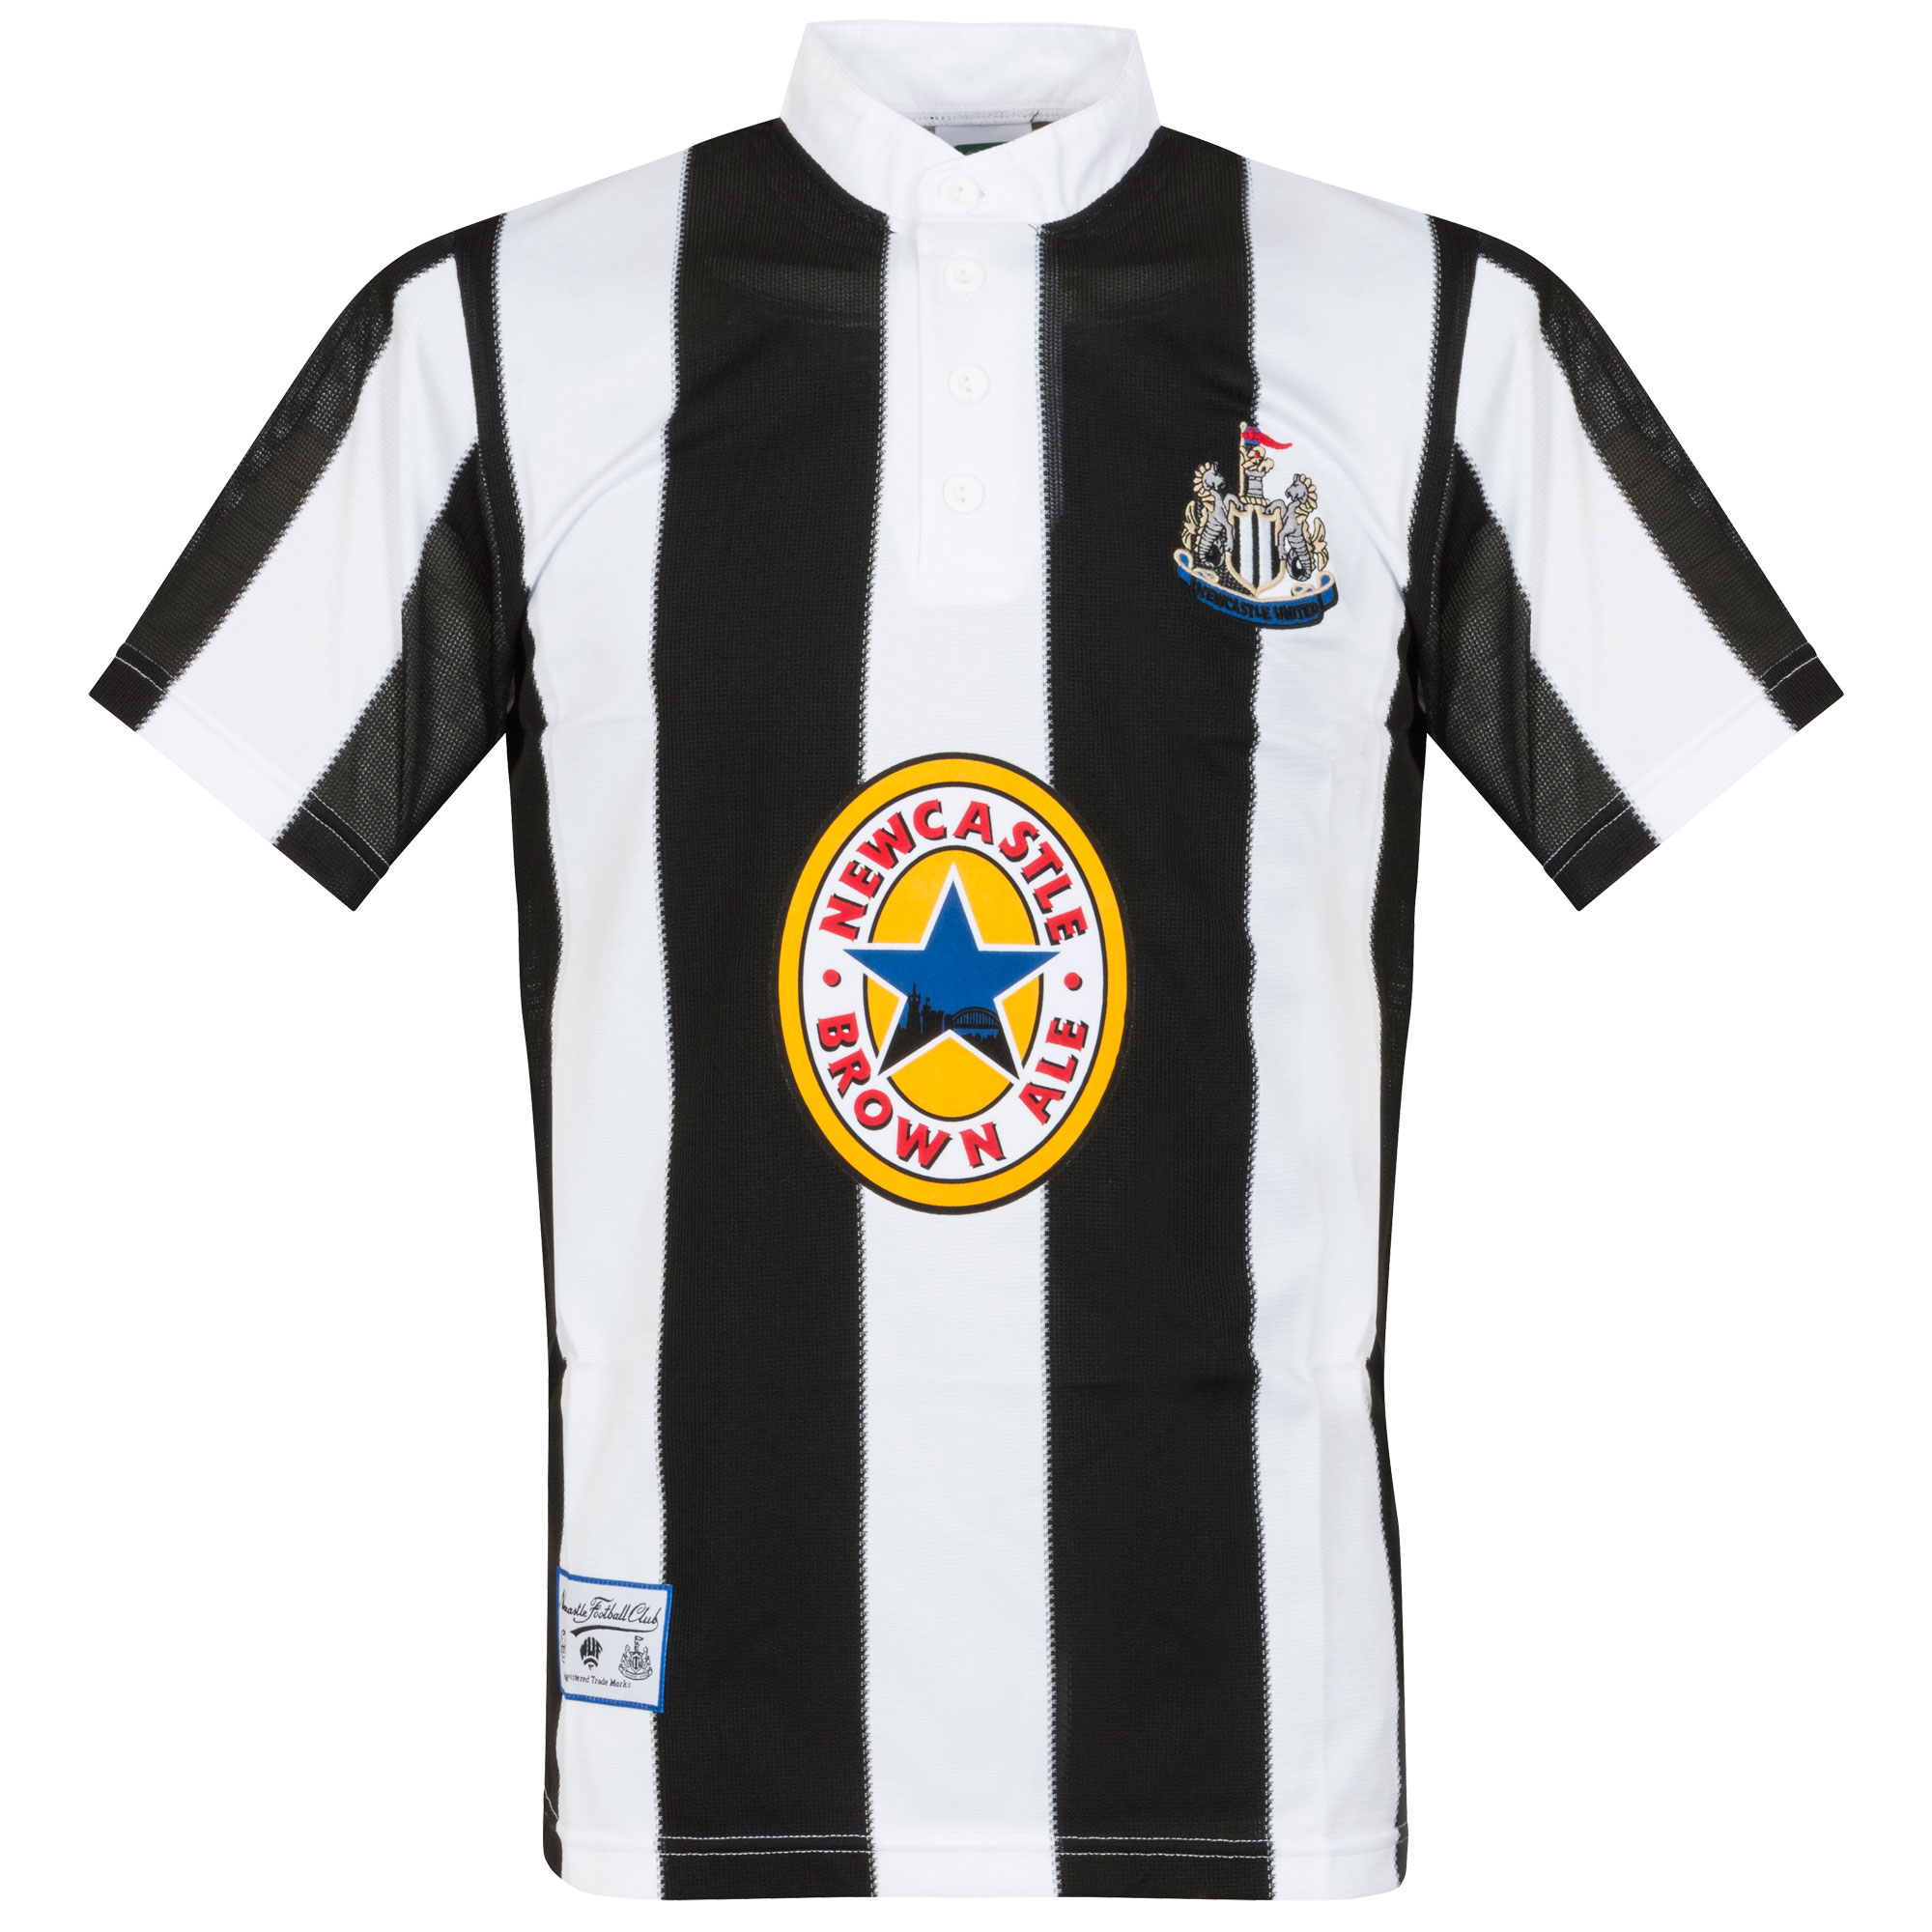 Score Draw Newcastle United Home Retro Shirt 1995-1996